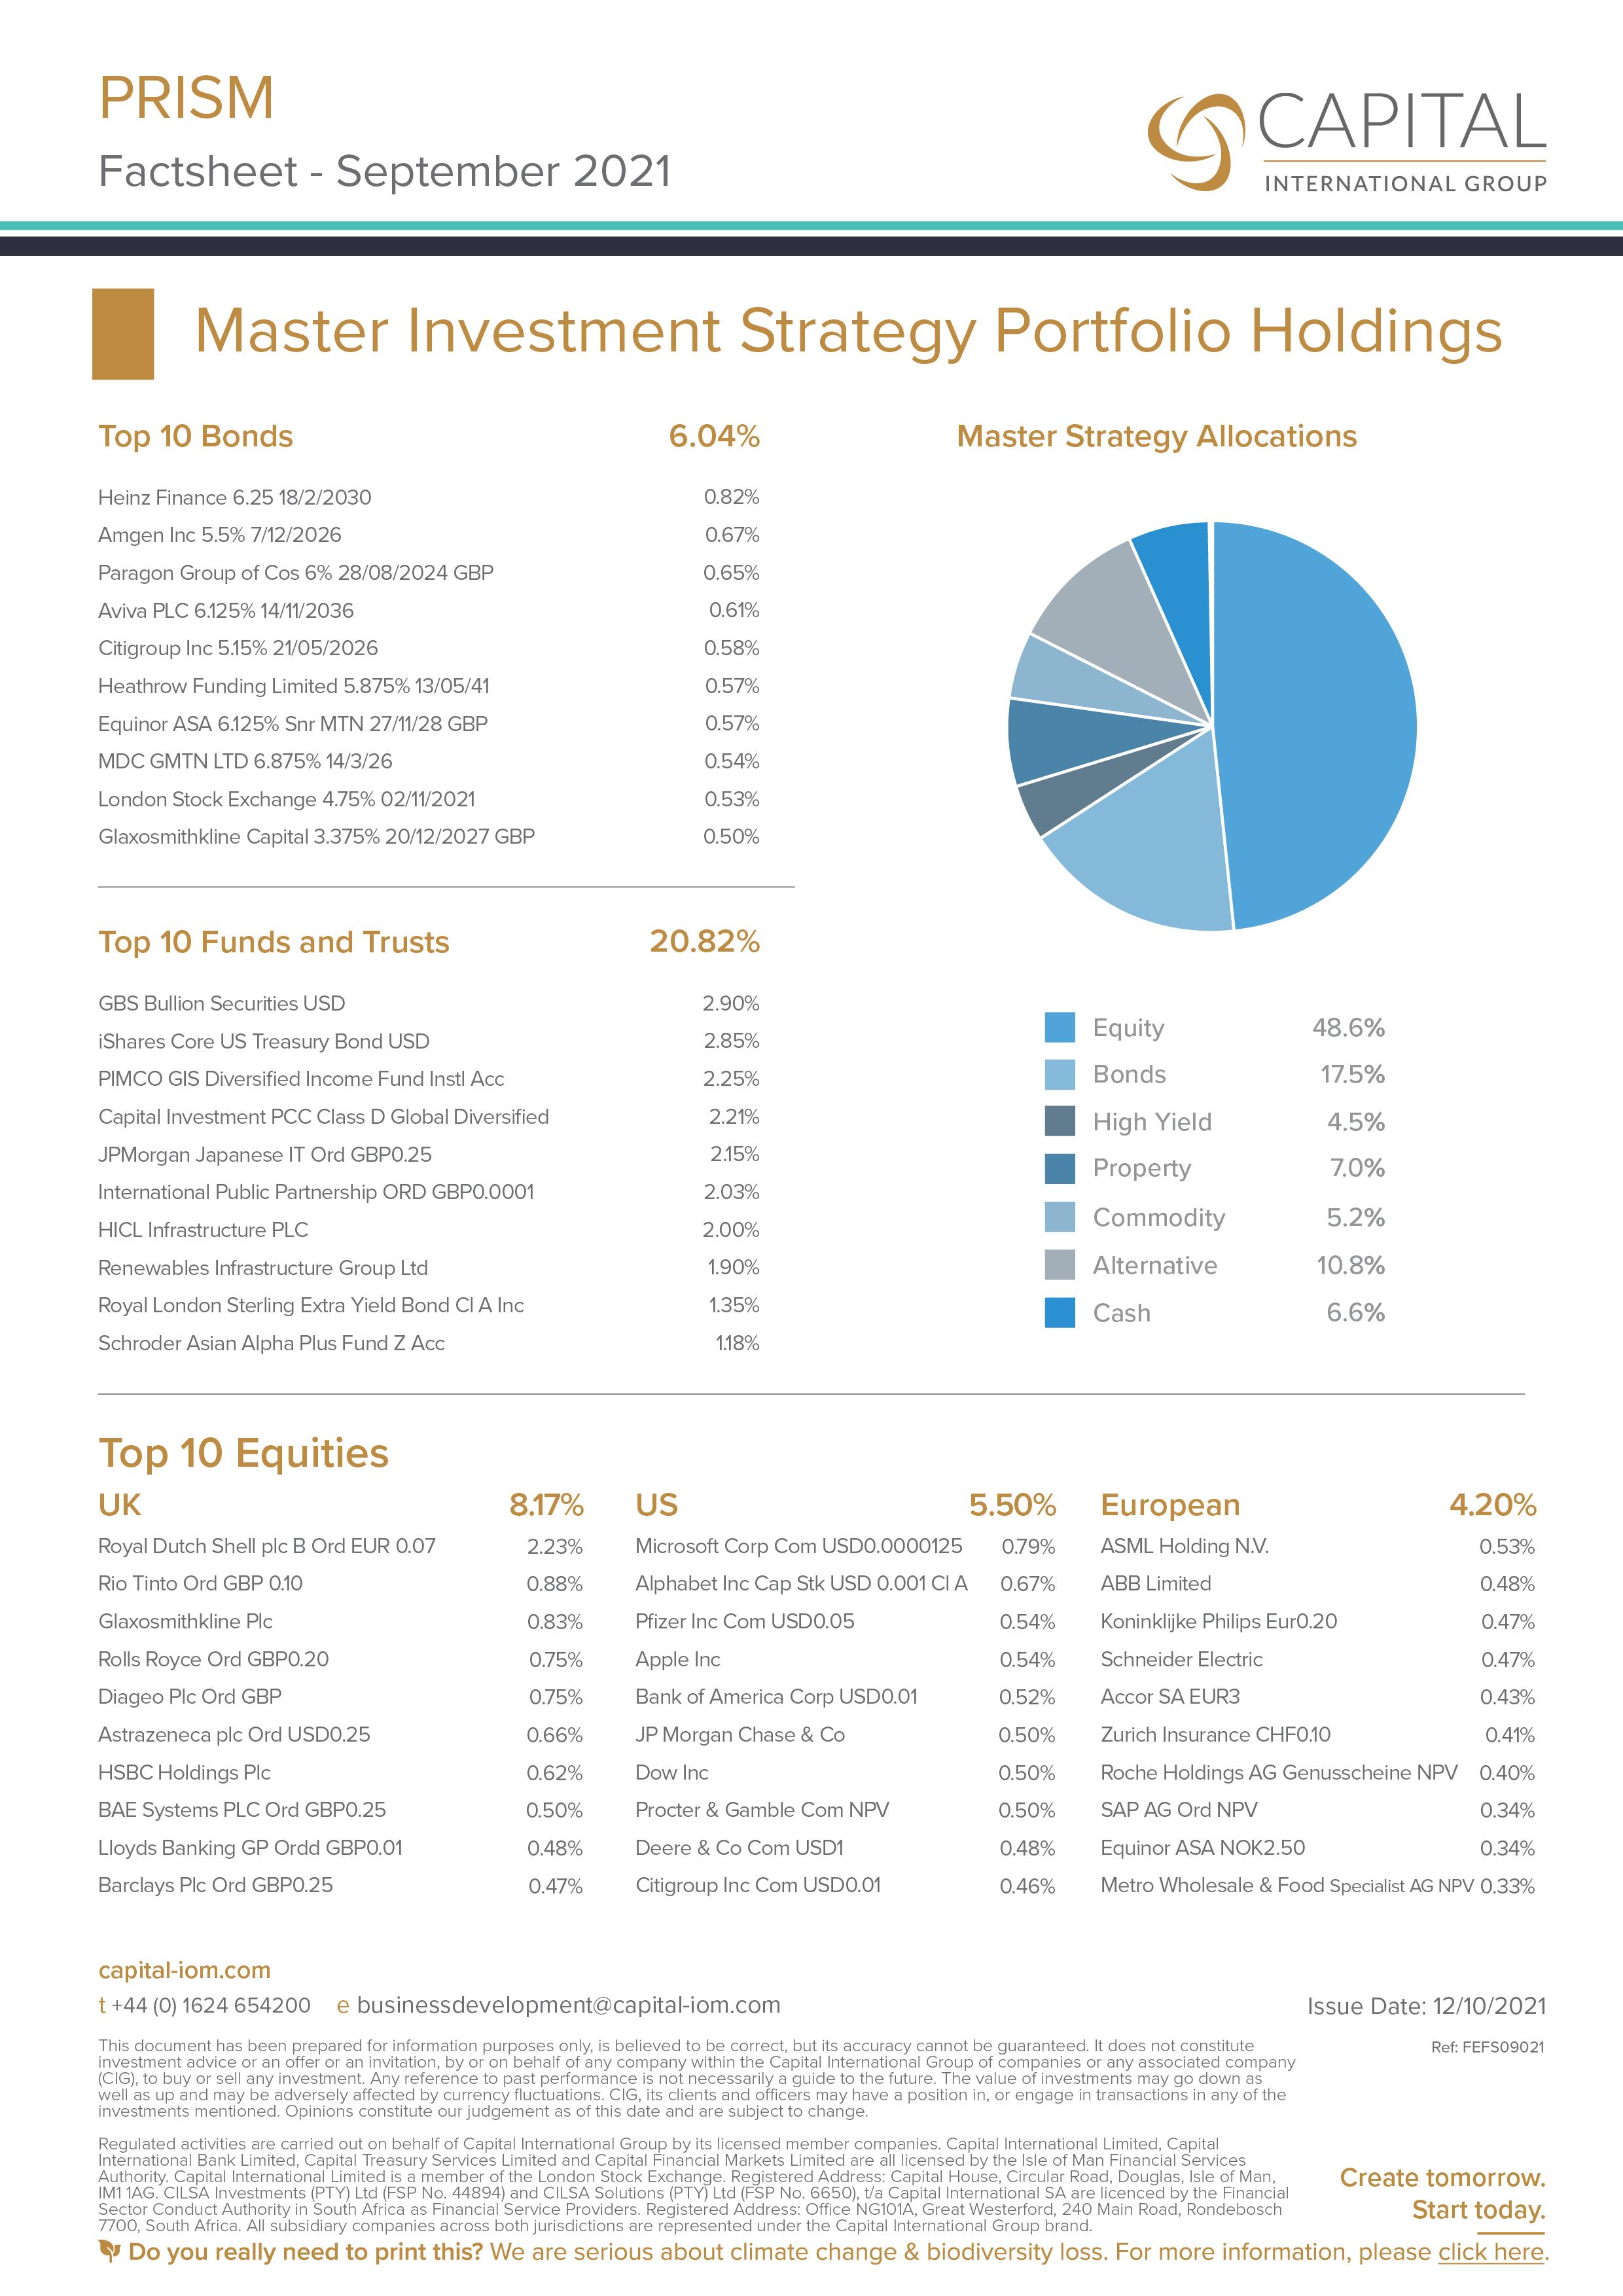 Prism Top 10 Holdings September 2021